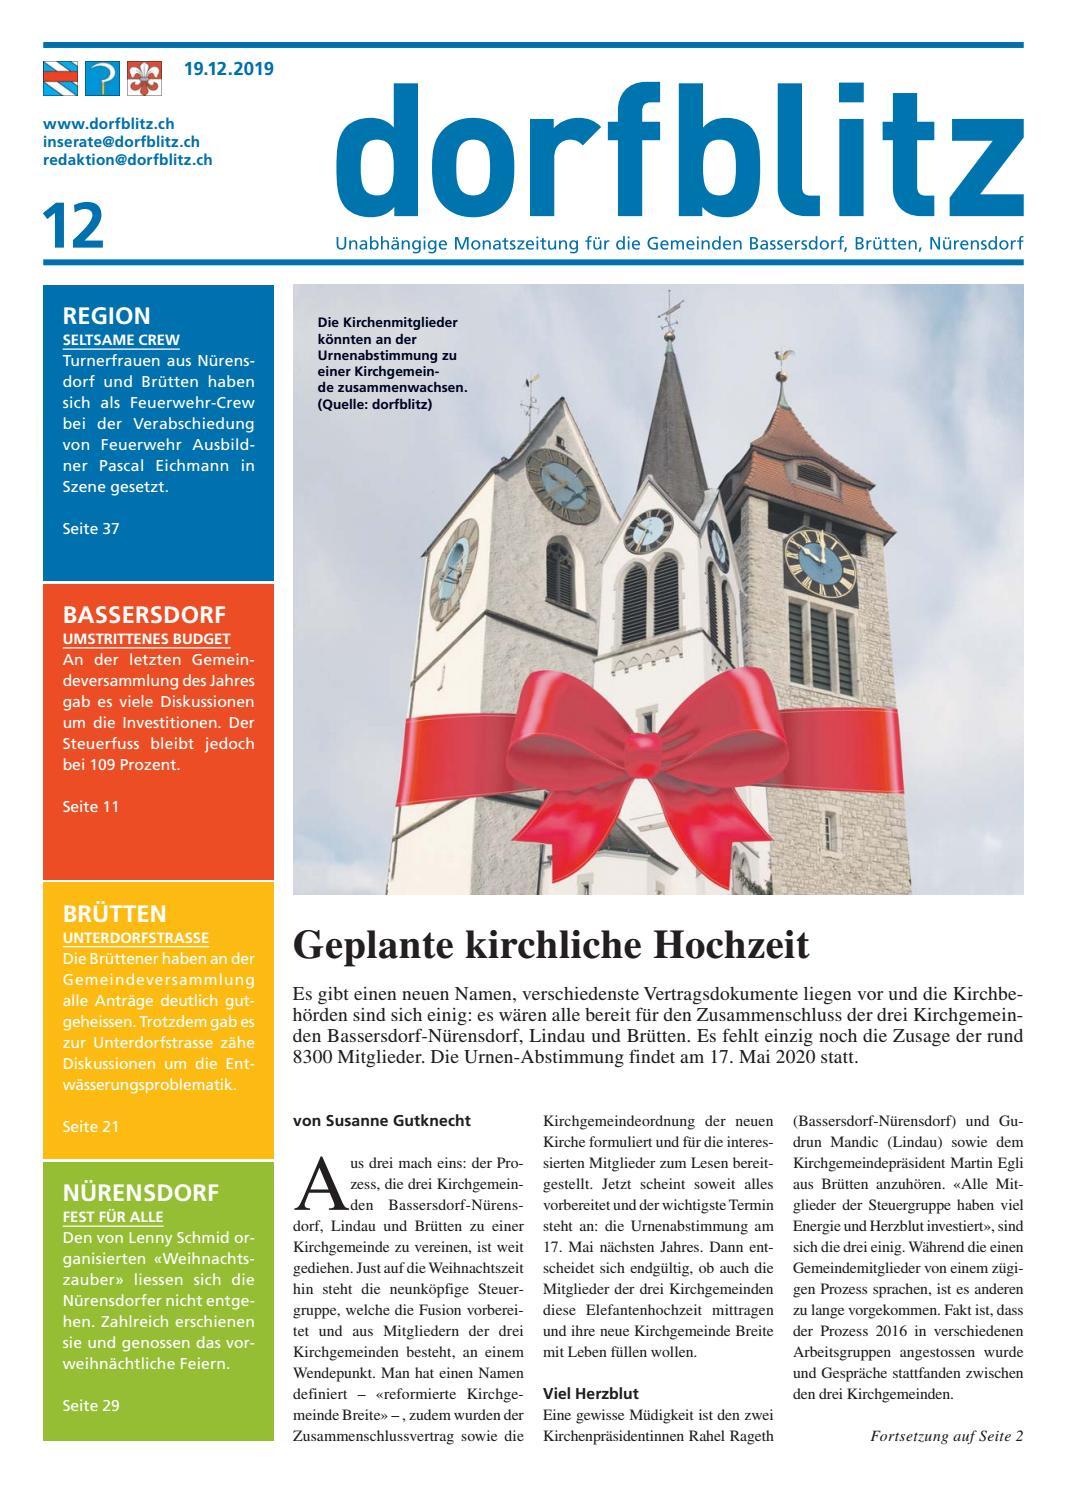 Caslano Online Partnersuche Heslibach Nette Leute Kennenlernen